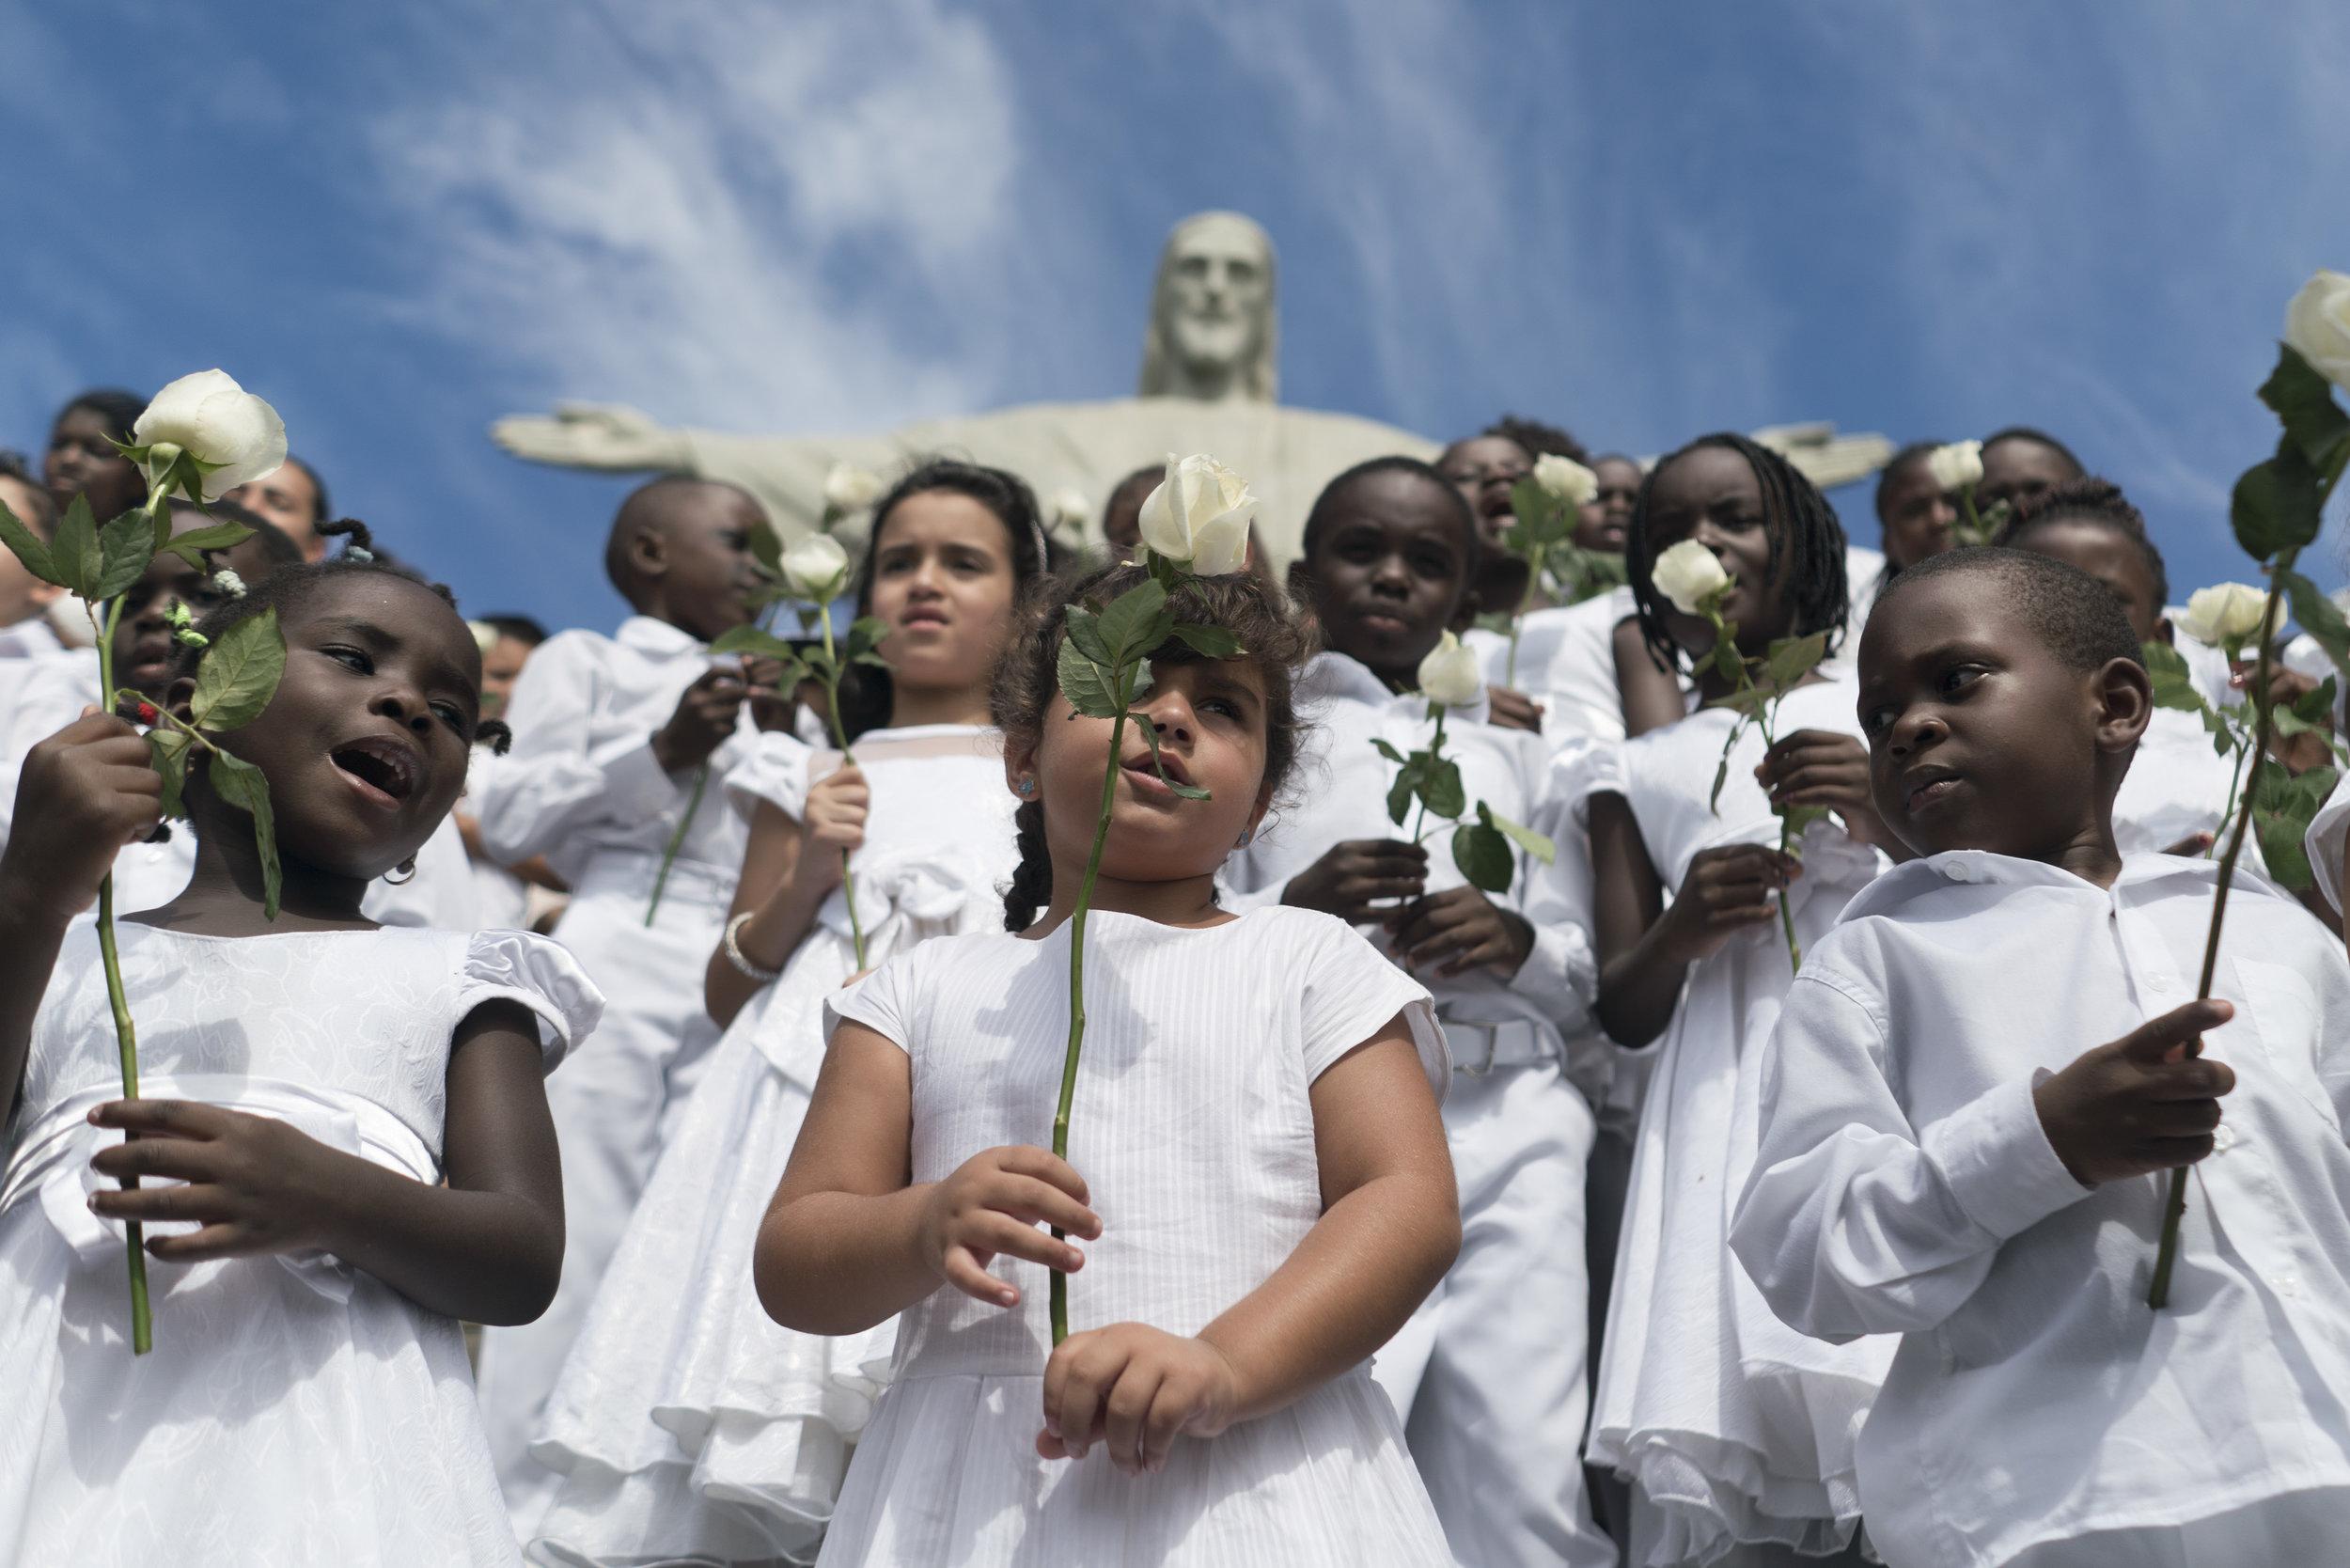 Brazil Syria Children